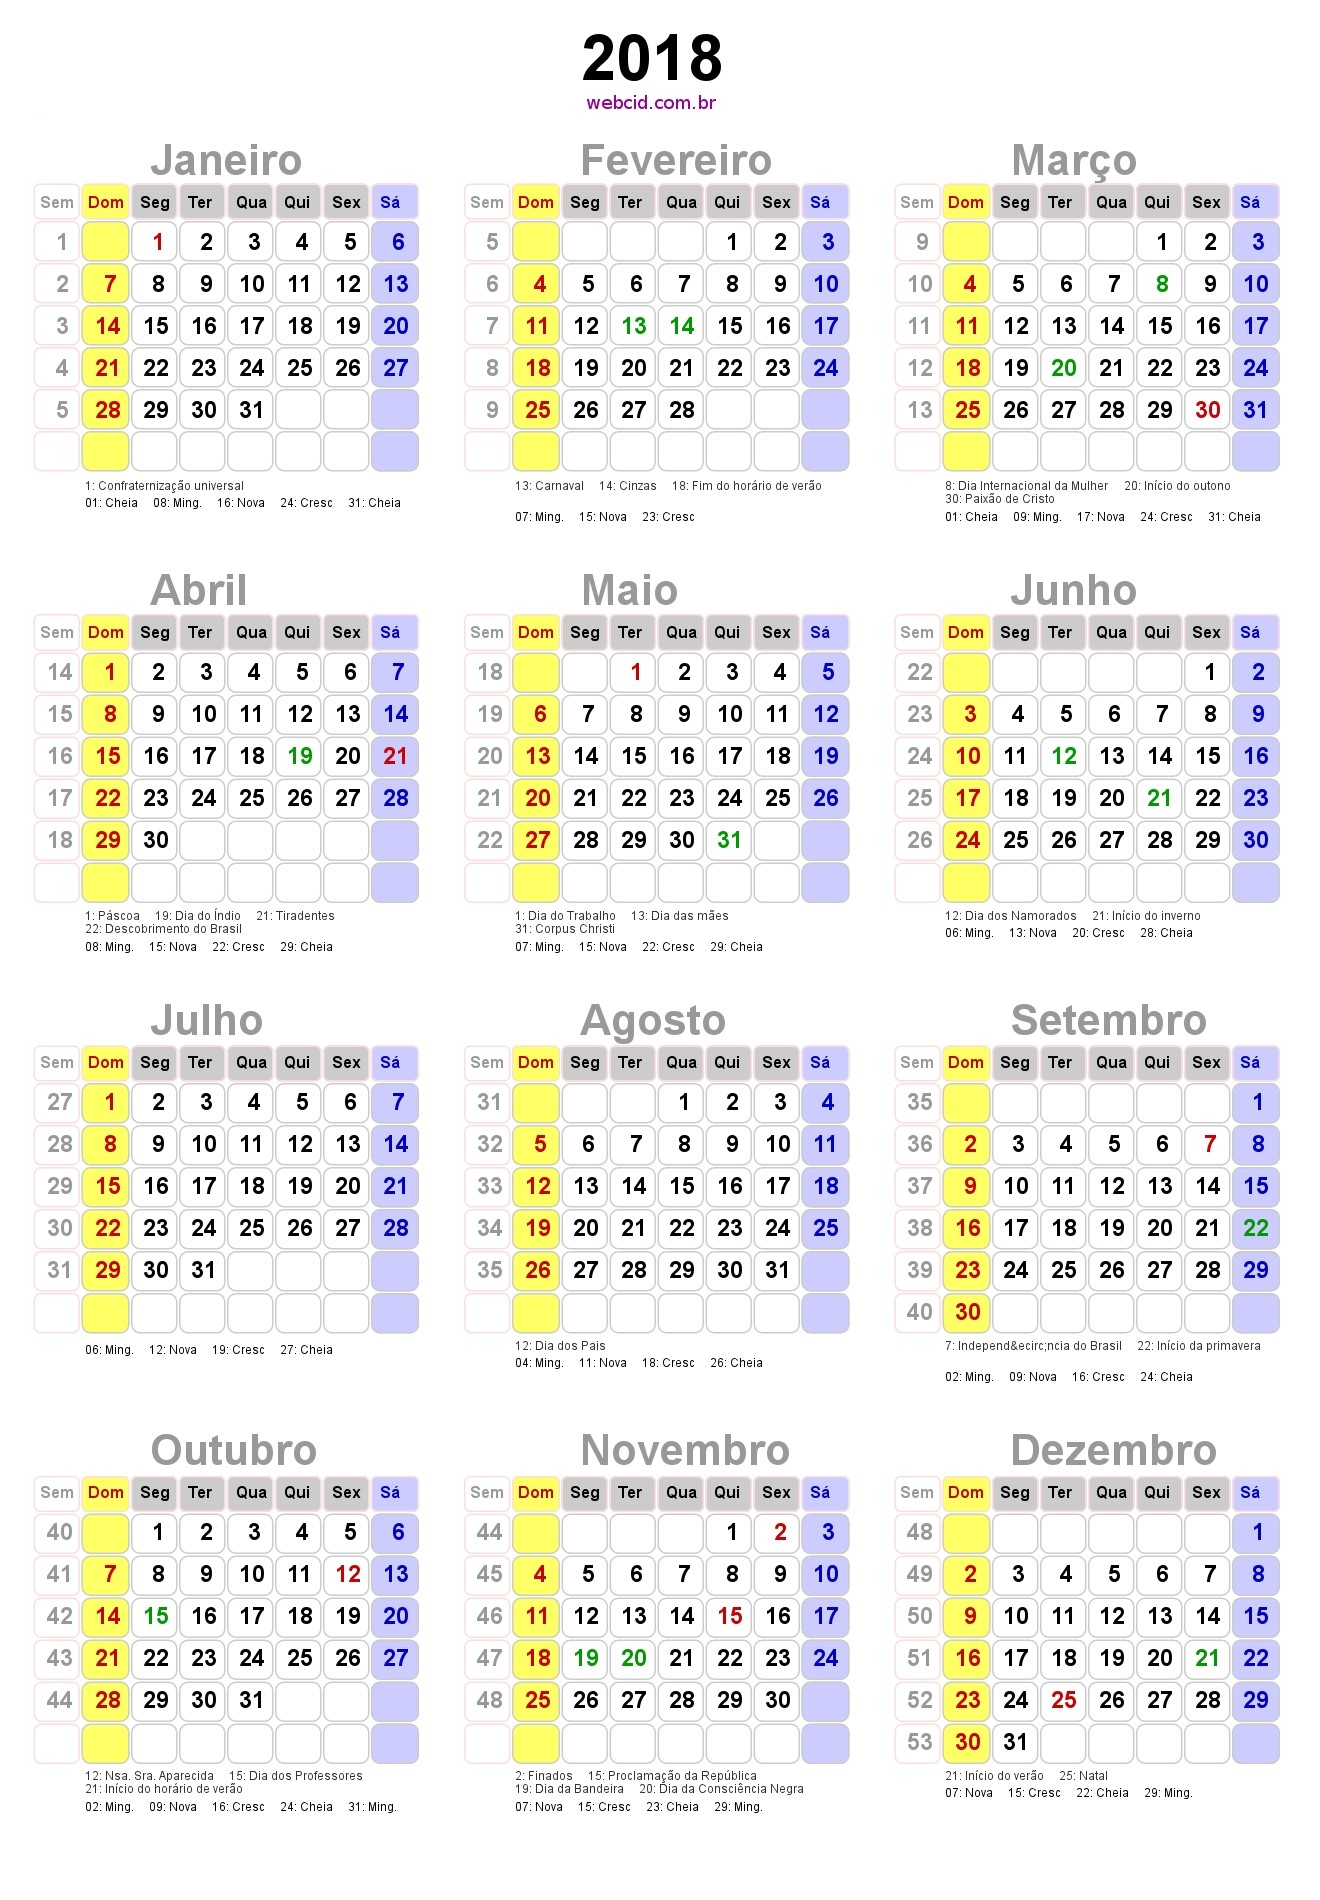 Calendario Anual 2019 Pdf Más Actual Edi Suparman – Page 52 – Template Calendar Design Of Calendario Anual 2019 Pdf Más Arriba-a-fecha Pin De Calendario Hispano En Calendario Con Feriados A±o 2019